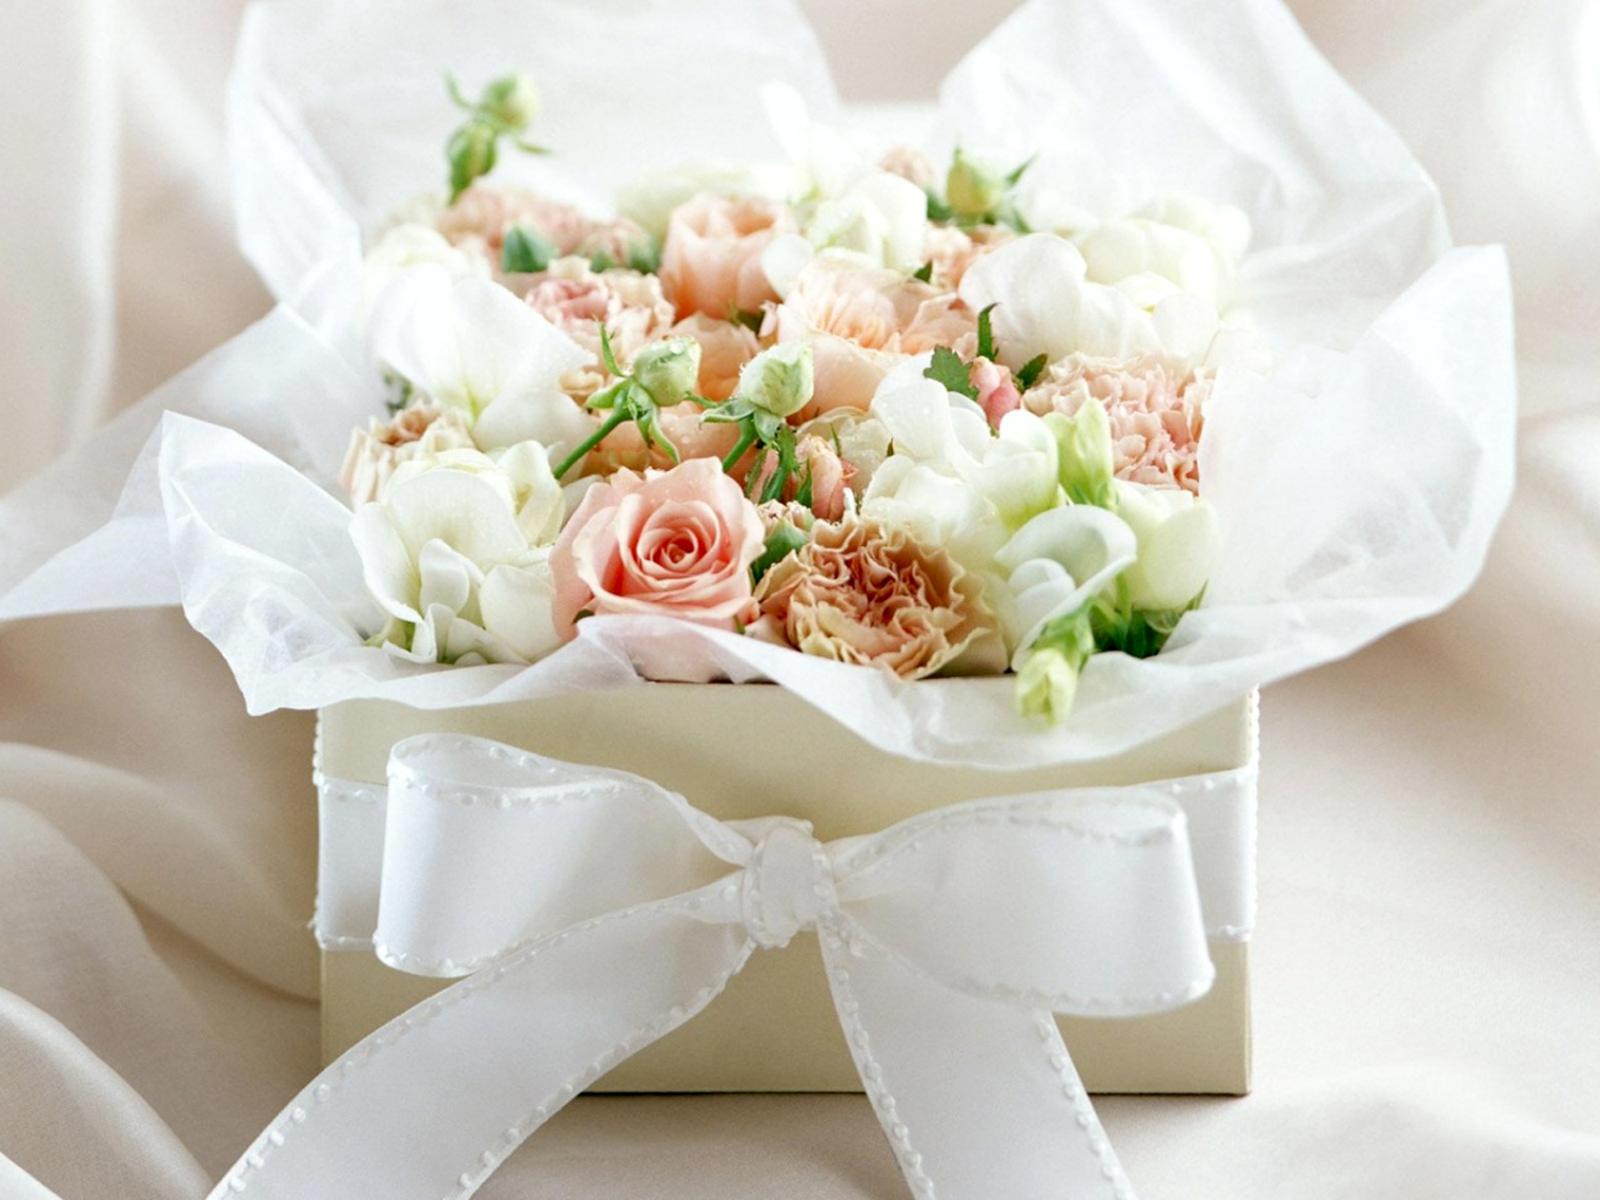 http://3.bp.blogspot.com/-mhqYD7PE0Uc/T3Dcjx7HZfI/AAAAAAAABBo/HmFhcbAw734/s1600/A_Buquet_of_Pink_White_Roses_HD_Wallpaper.jpg